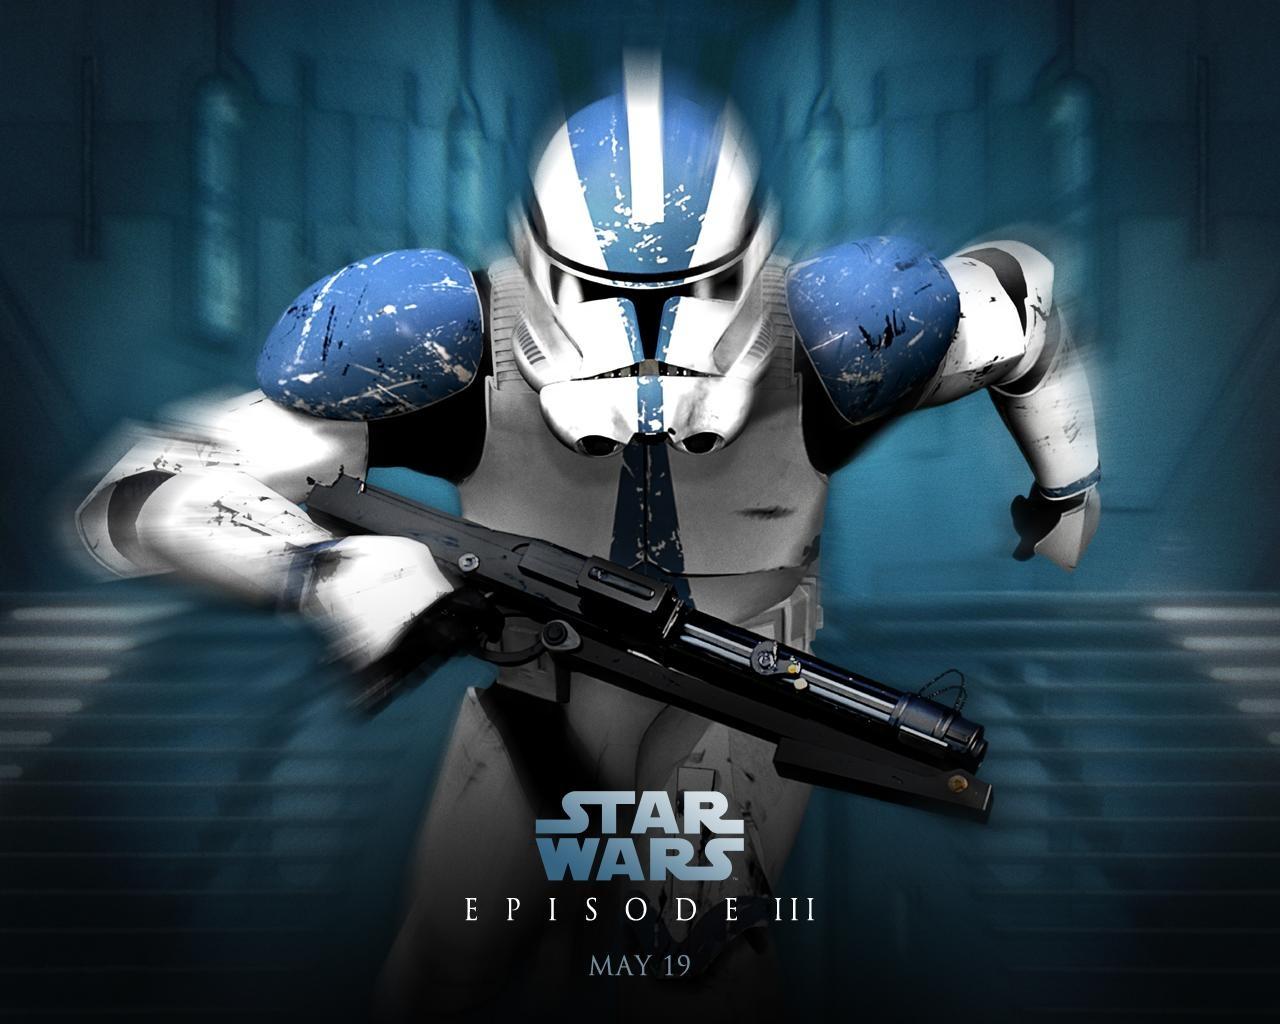 Star Wars: The Poli-Sci Jedi: Does Palpatine have to buy ...